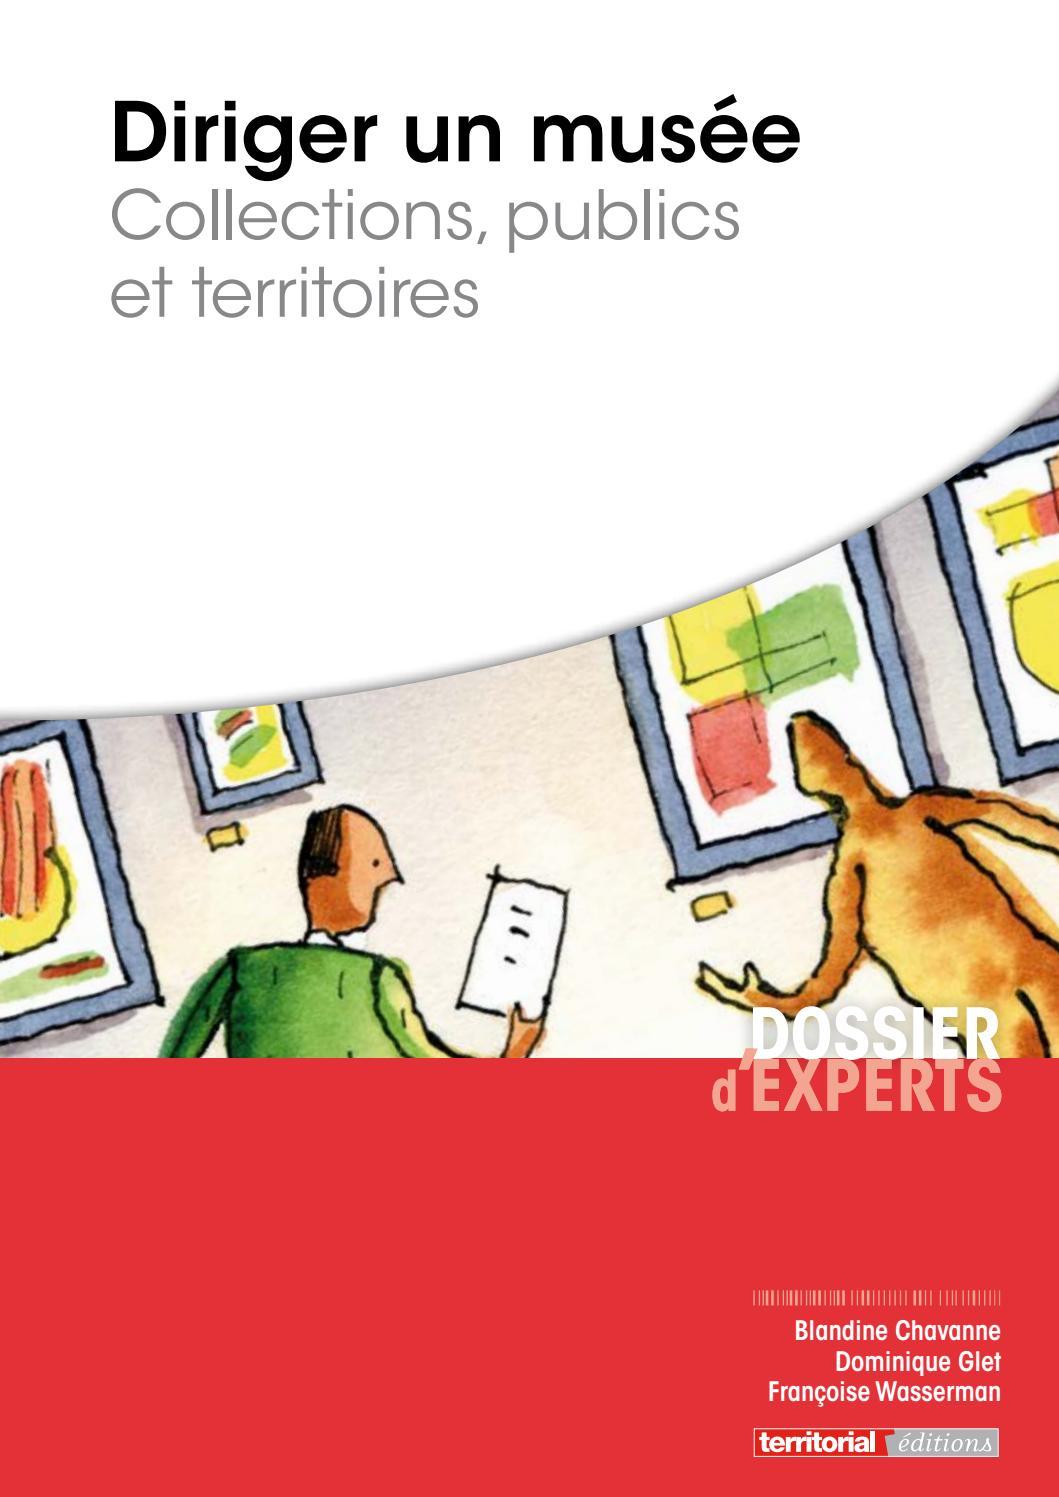 Diriger un musée - Collections, publics et territoires by INFOPRO DIGITAL -  issuu